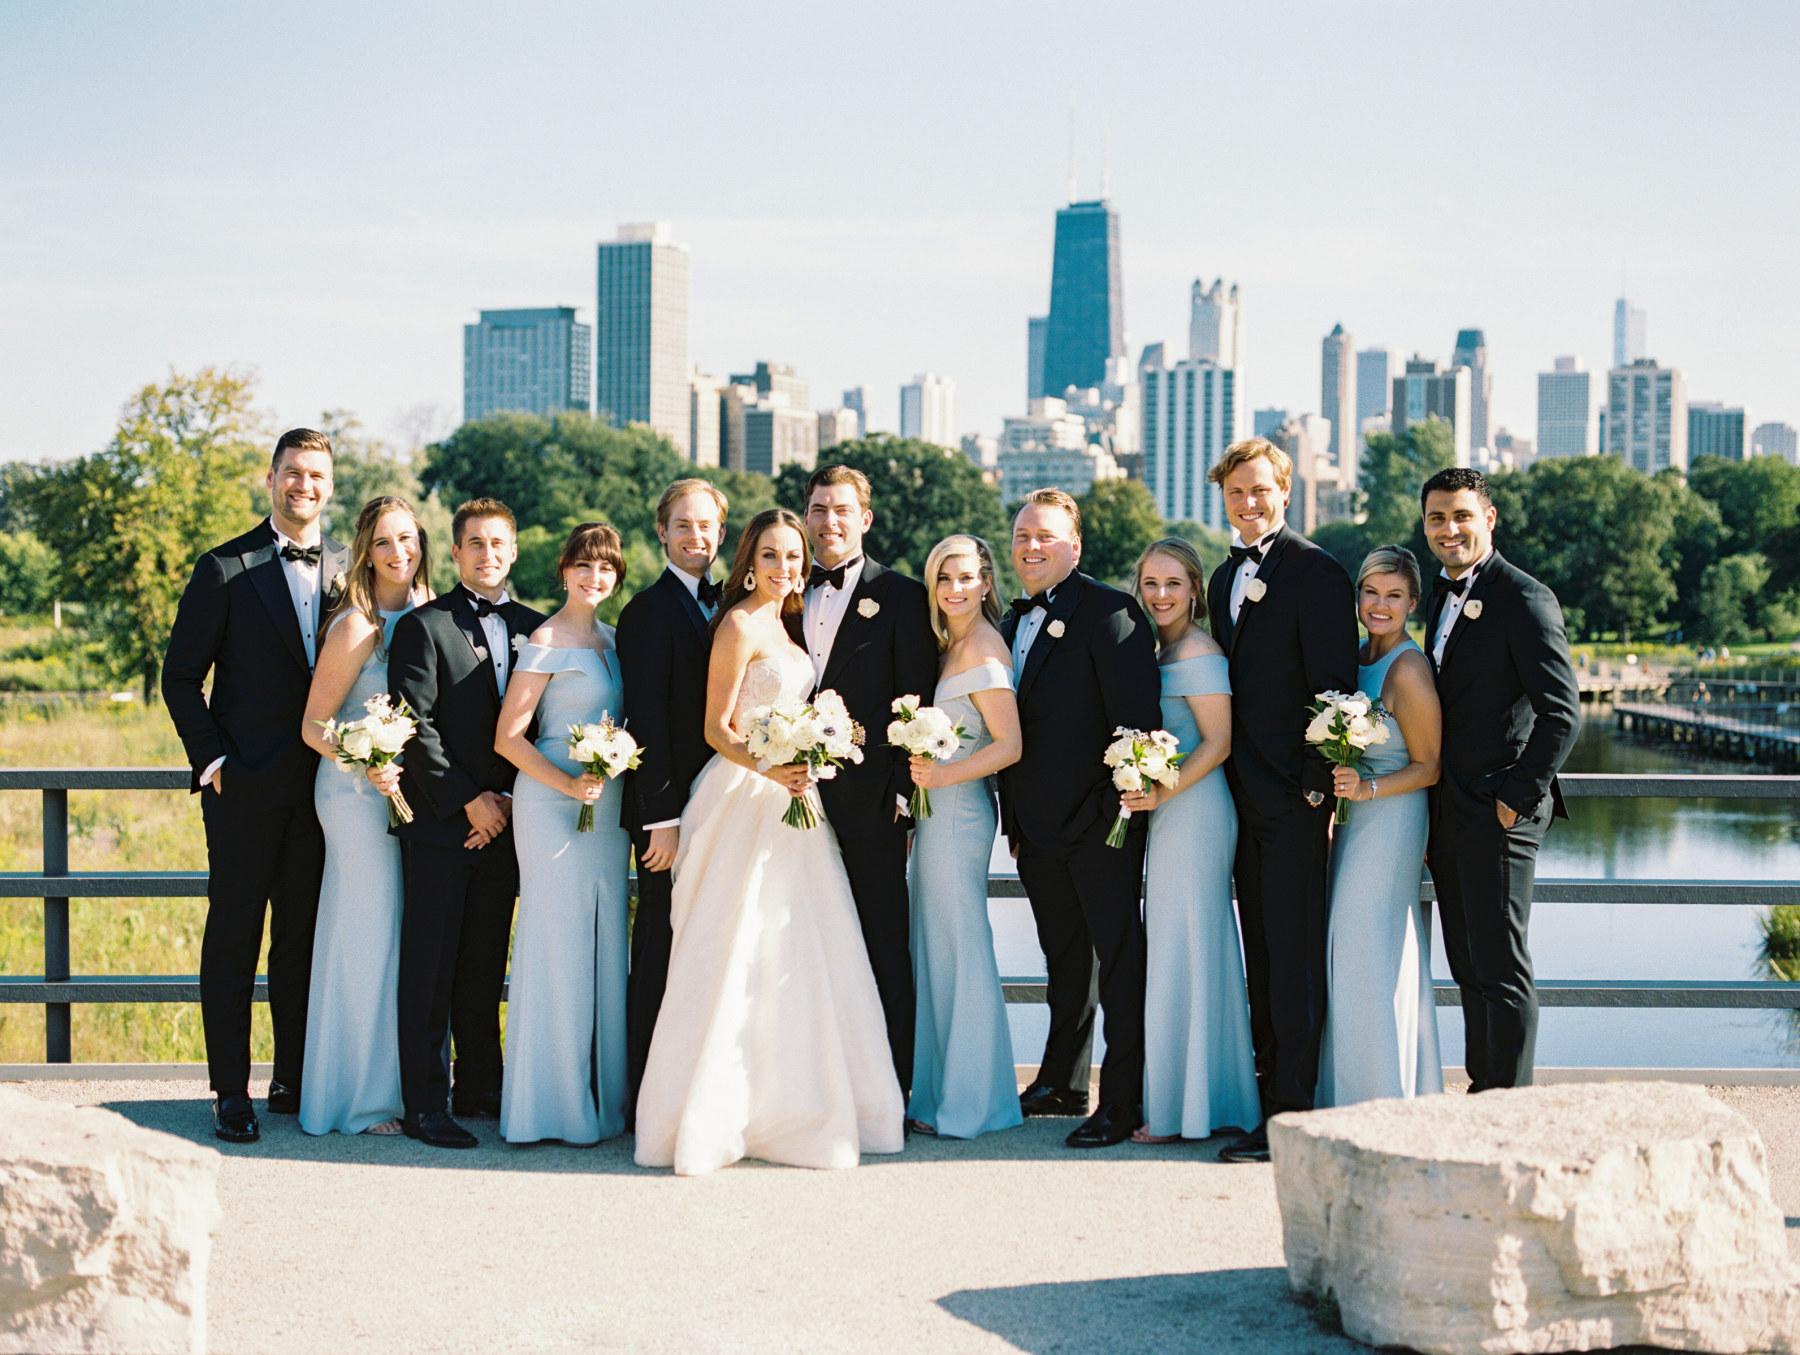 Elegant Light Blue Bridesmaids Bridal Party